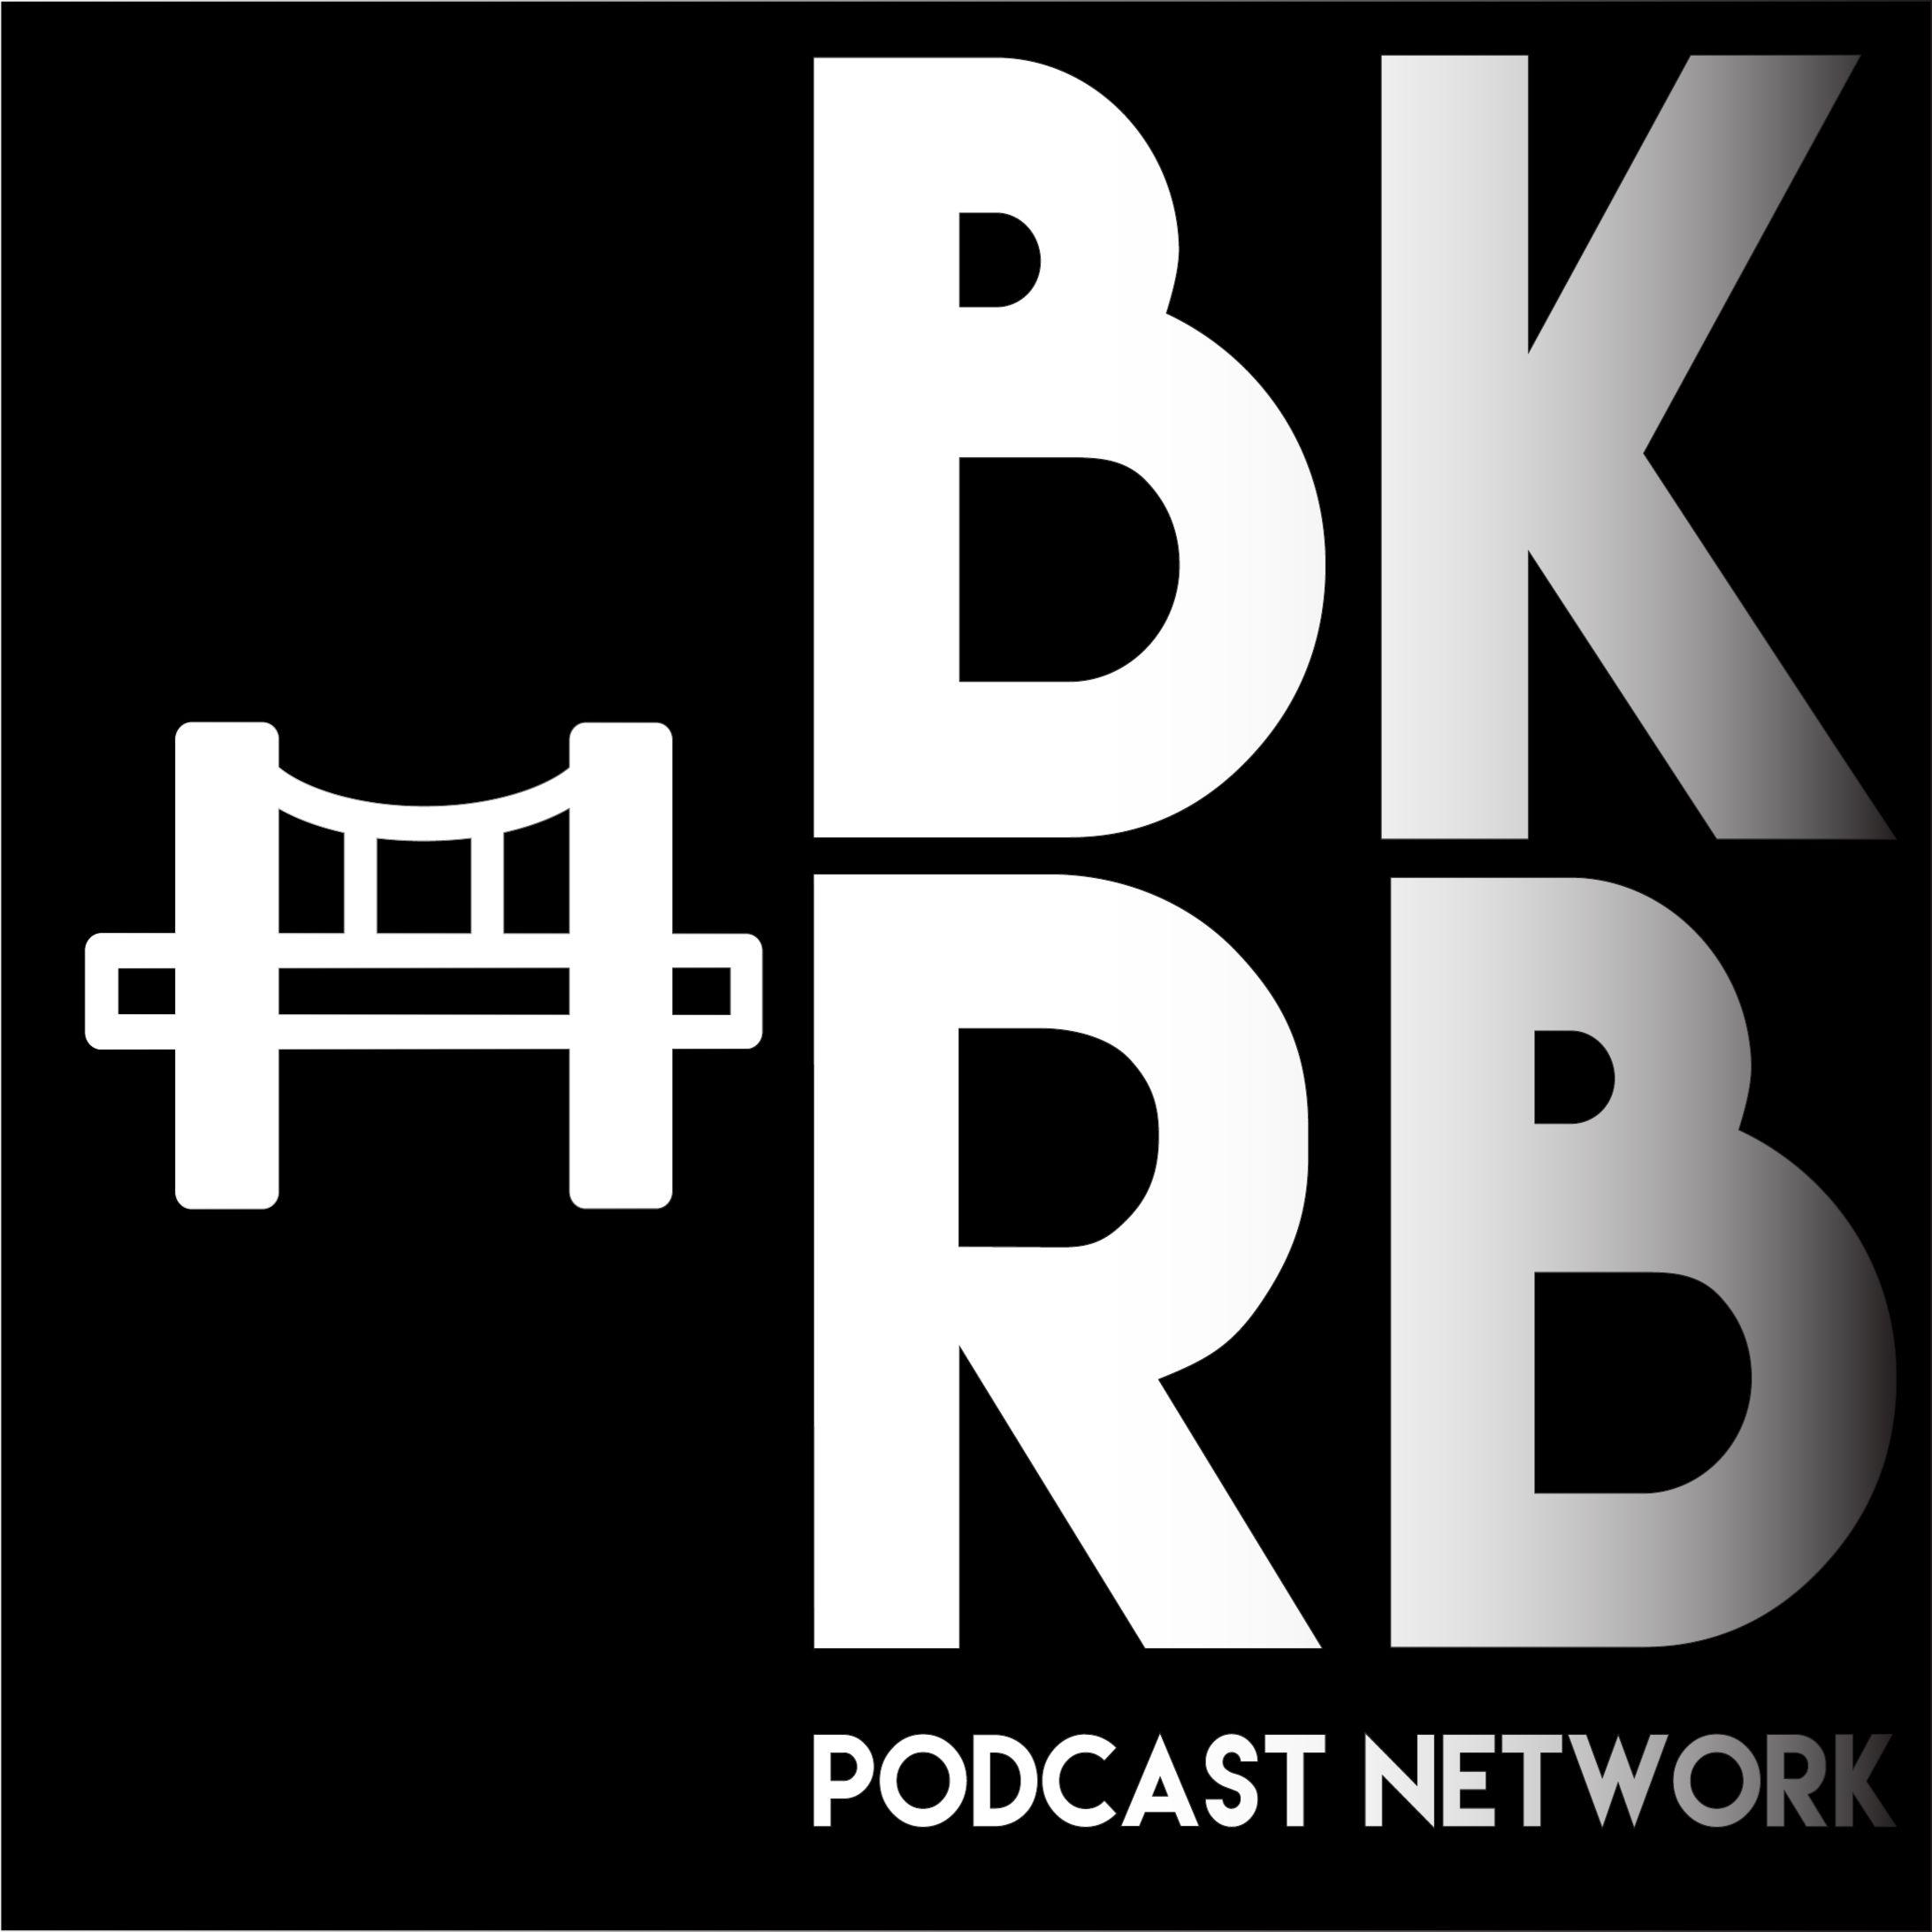 BKRB Network